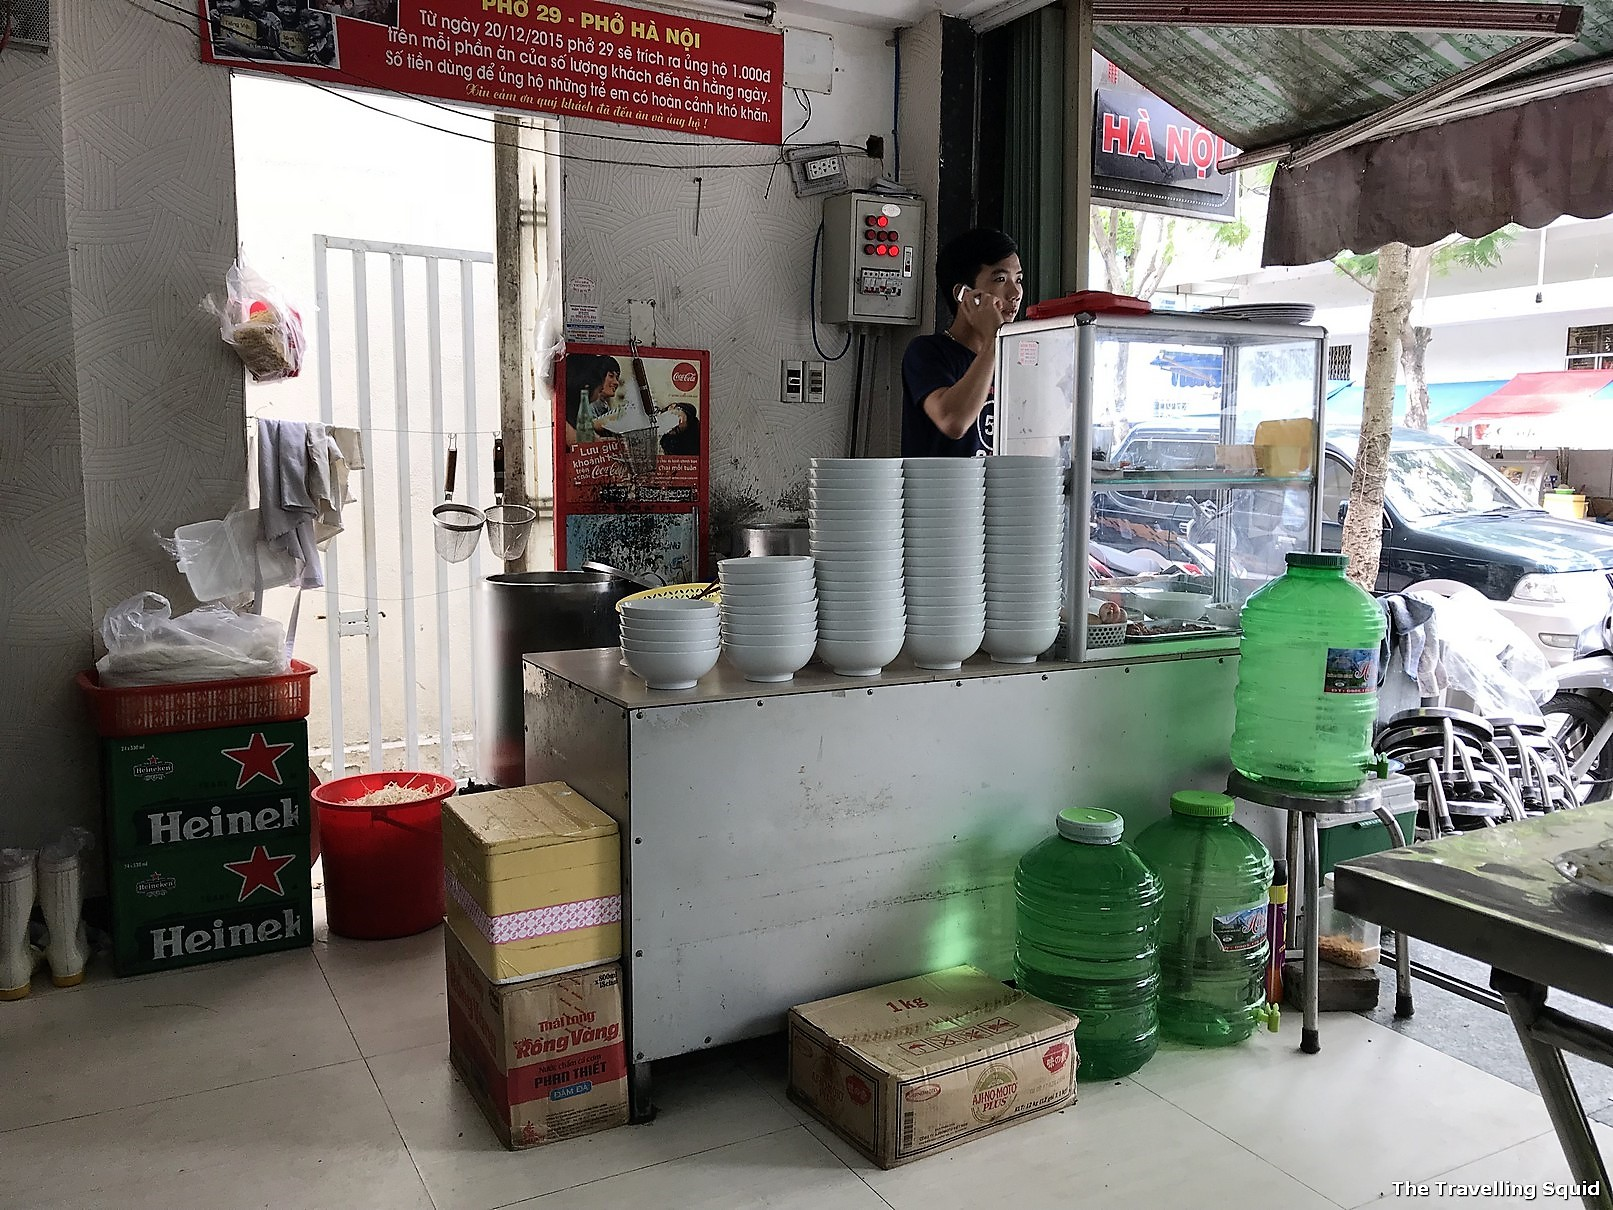 pho 29 hanoi danang